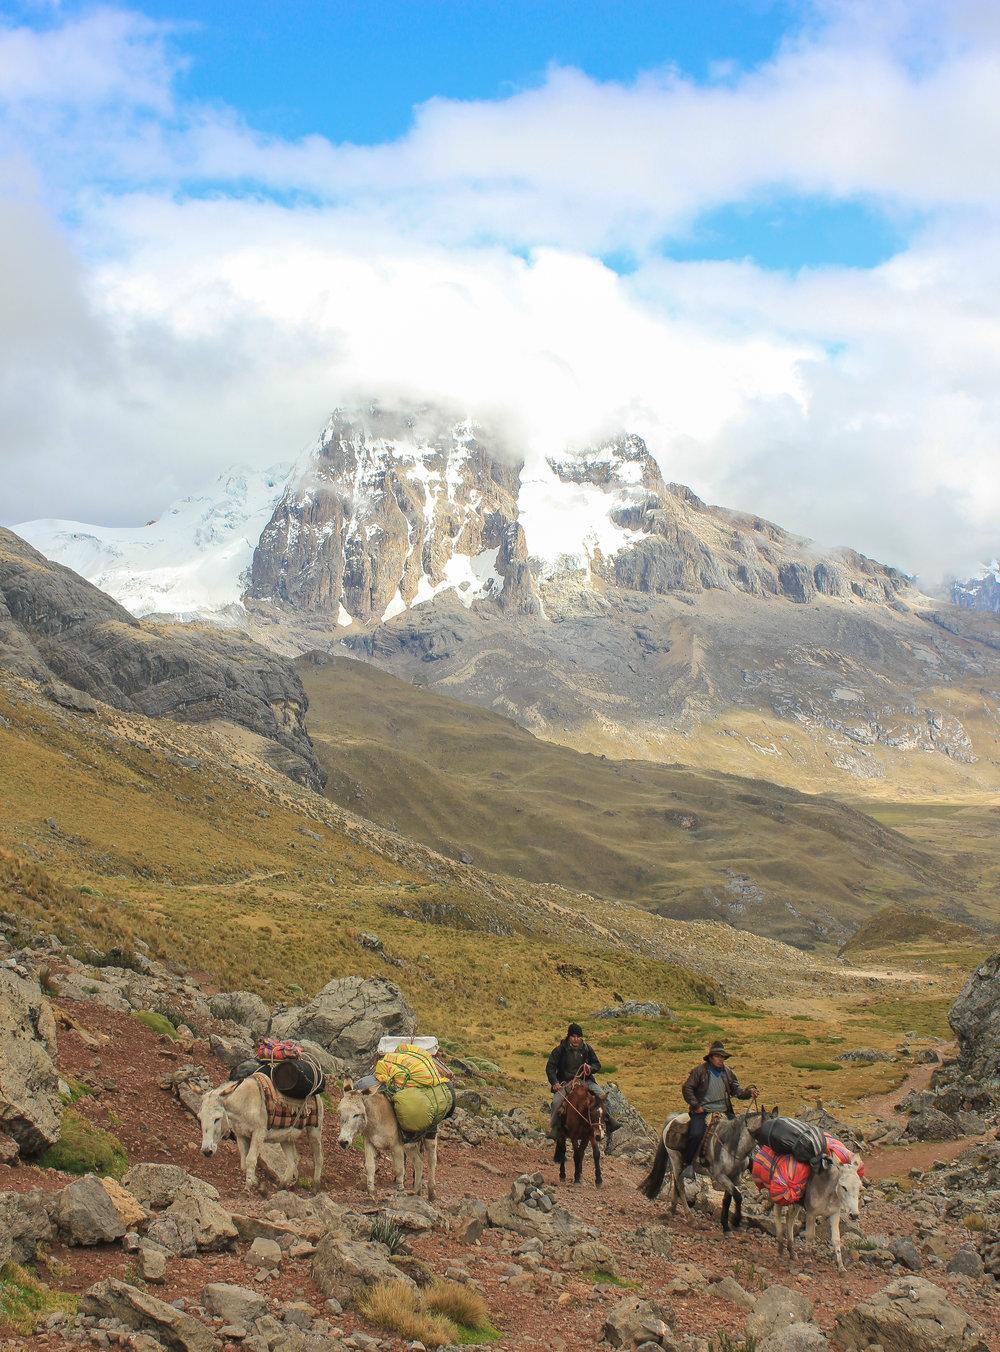 Donkys approaching the top of the Portachuelo de Huayhuash Pass, 15,700ft.